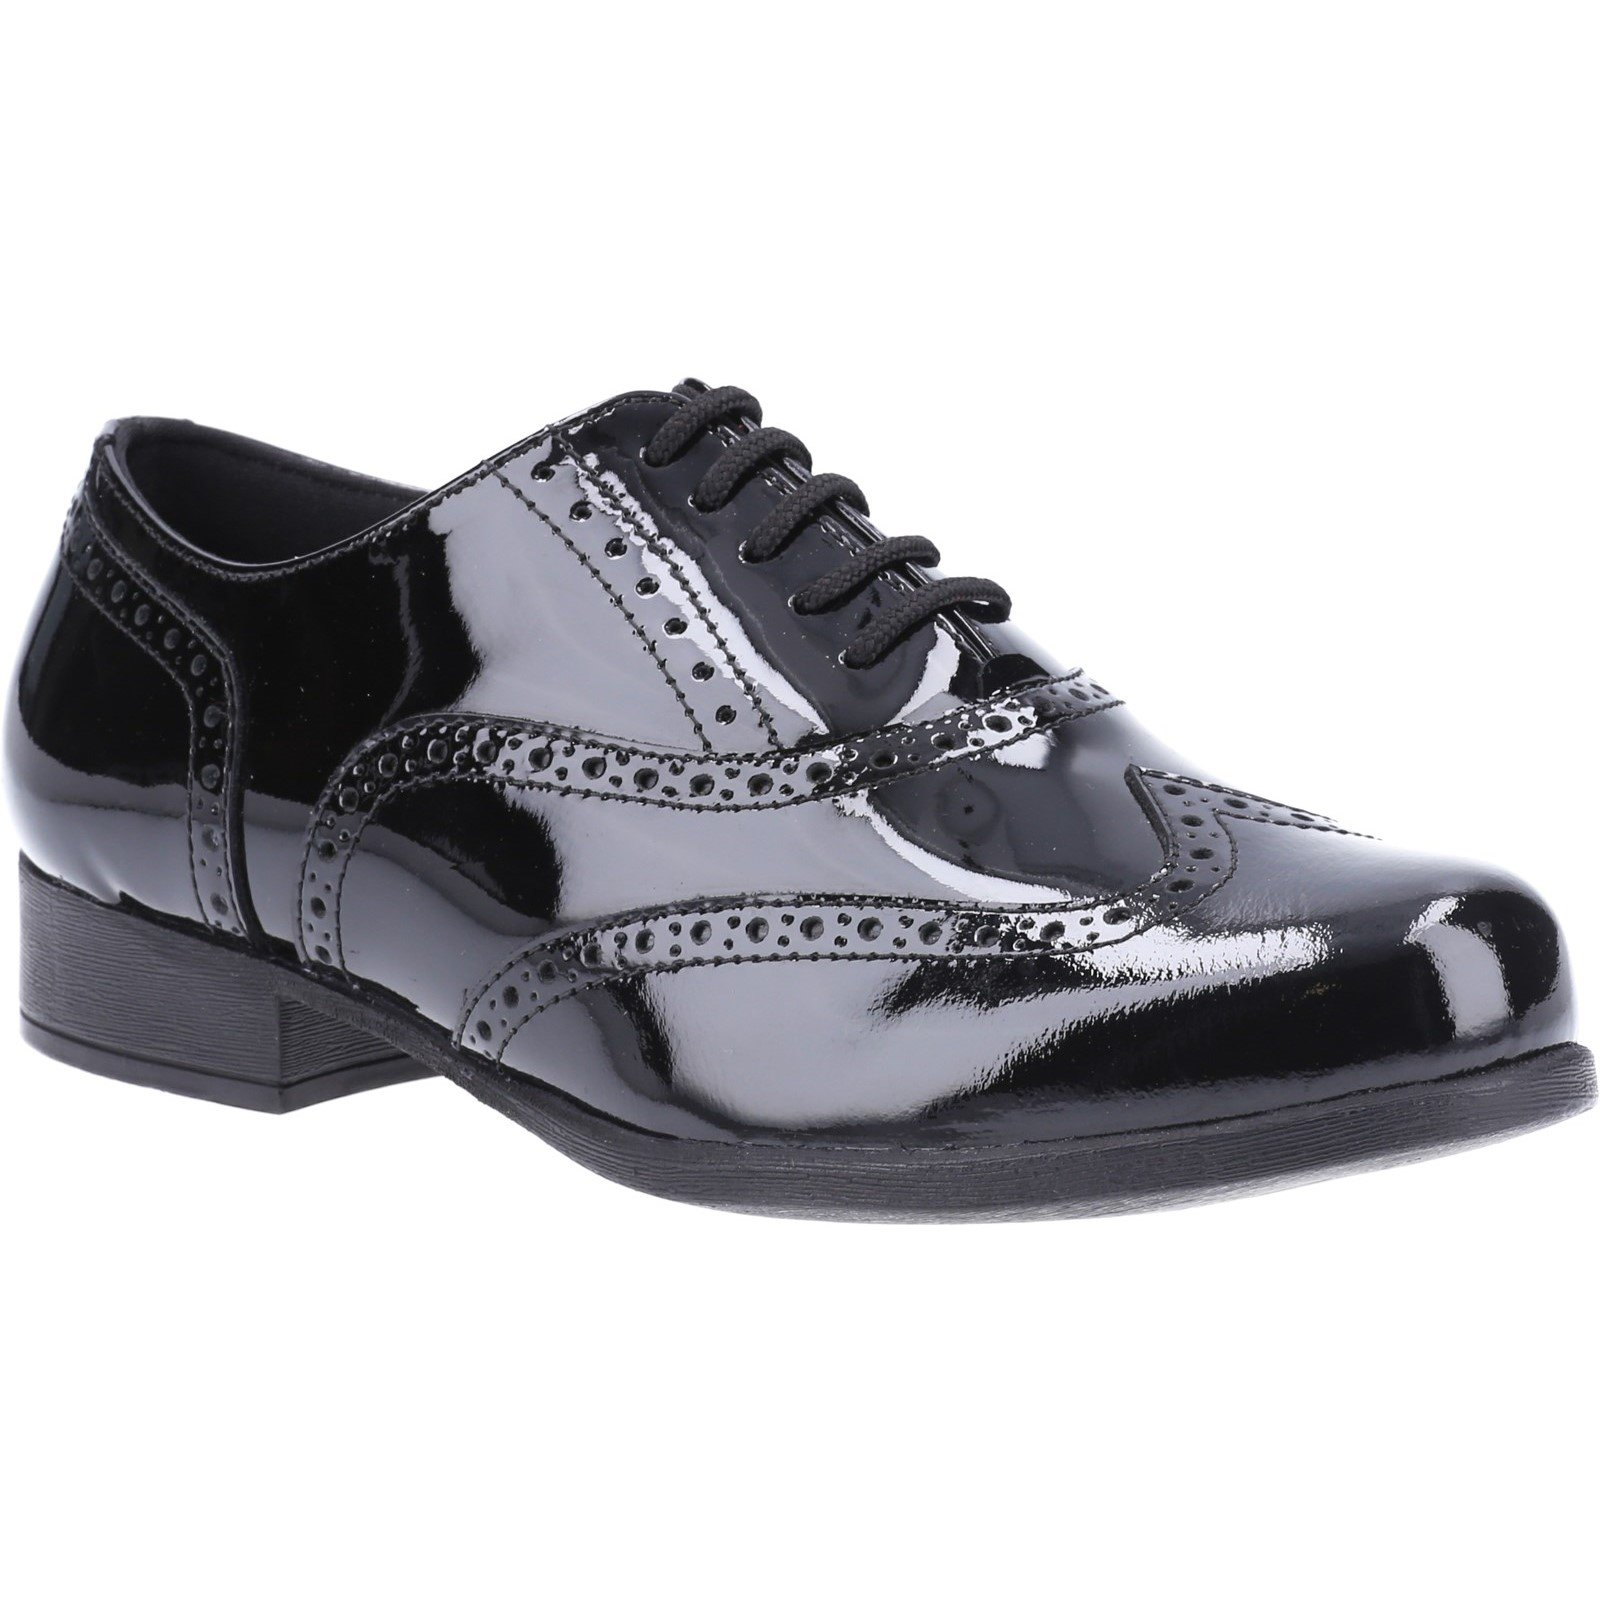 Hush Puppies Kid's Kada Junior School Brogue Shoe Patent Black 32597 - Patent Black 13